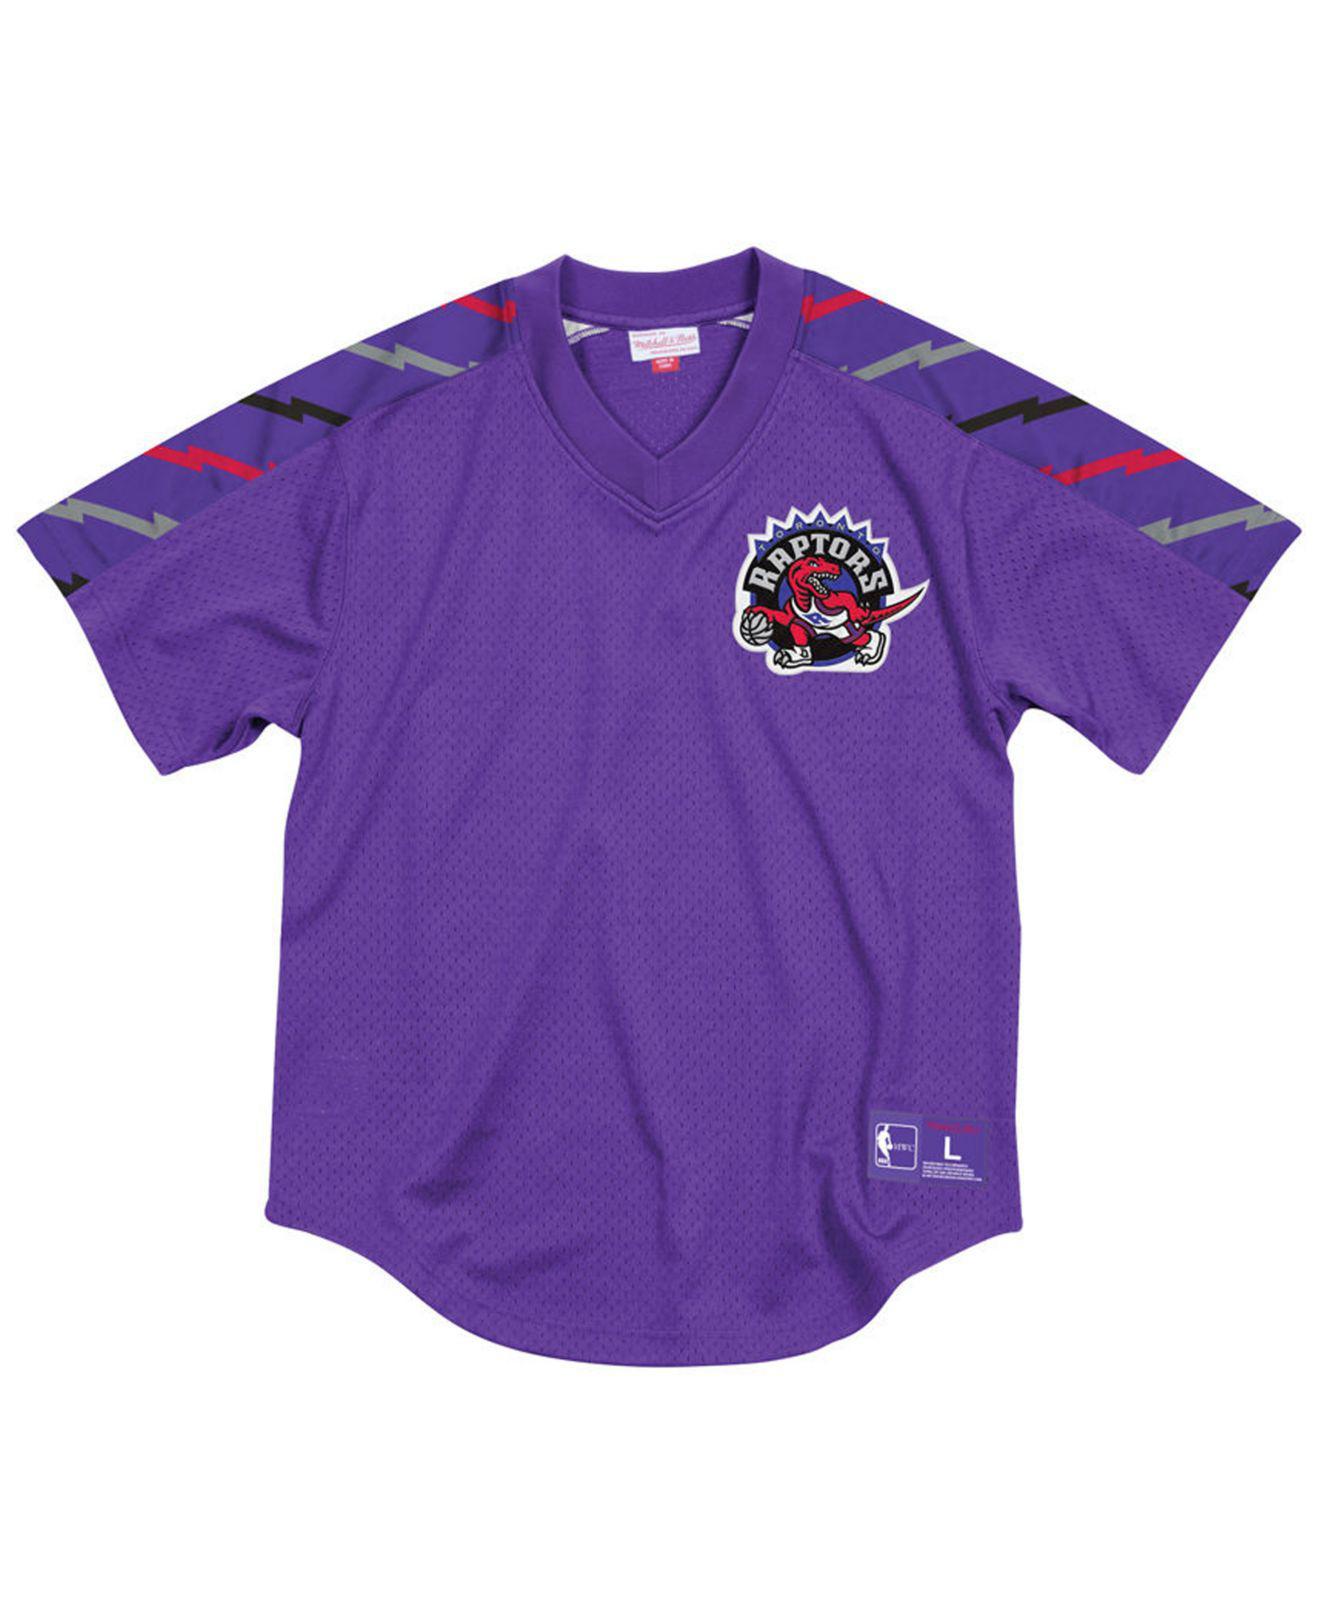 26a02c6f34d3b8 Mitchell   Ness. Men s Purple Toronto Raptors Winning Team Mesh V-neck  Jersey